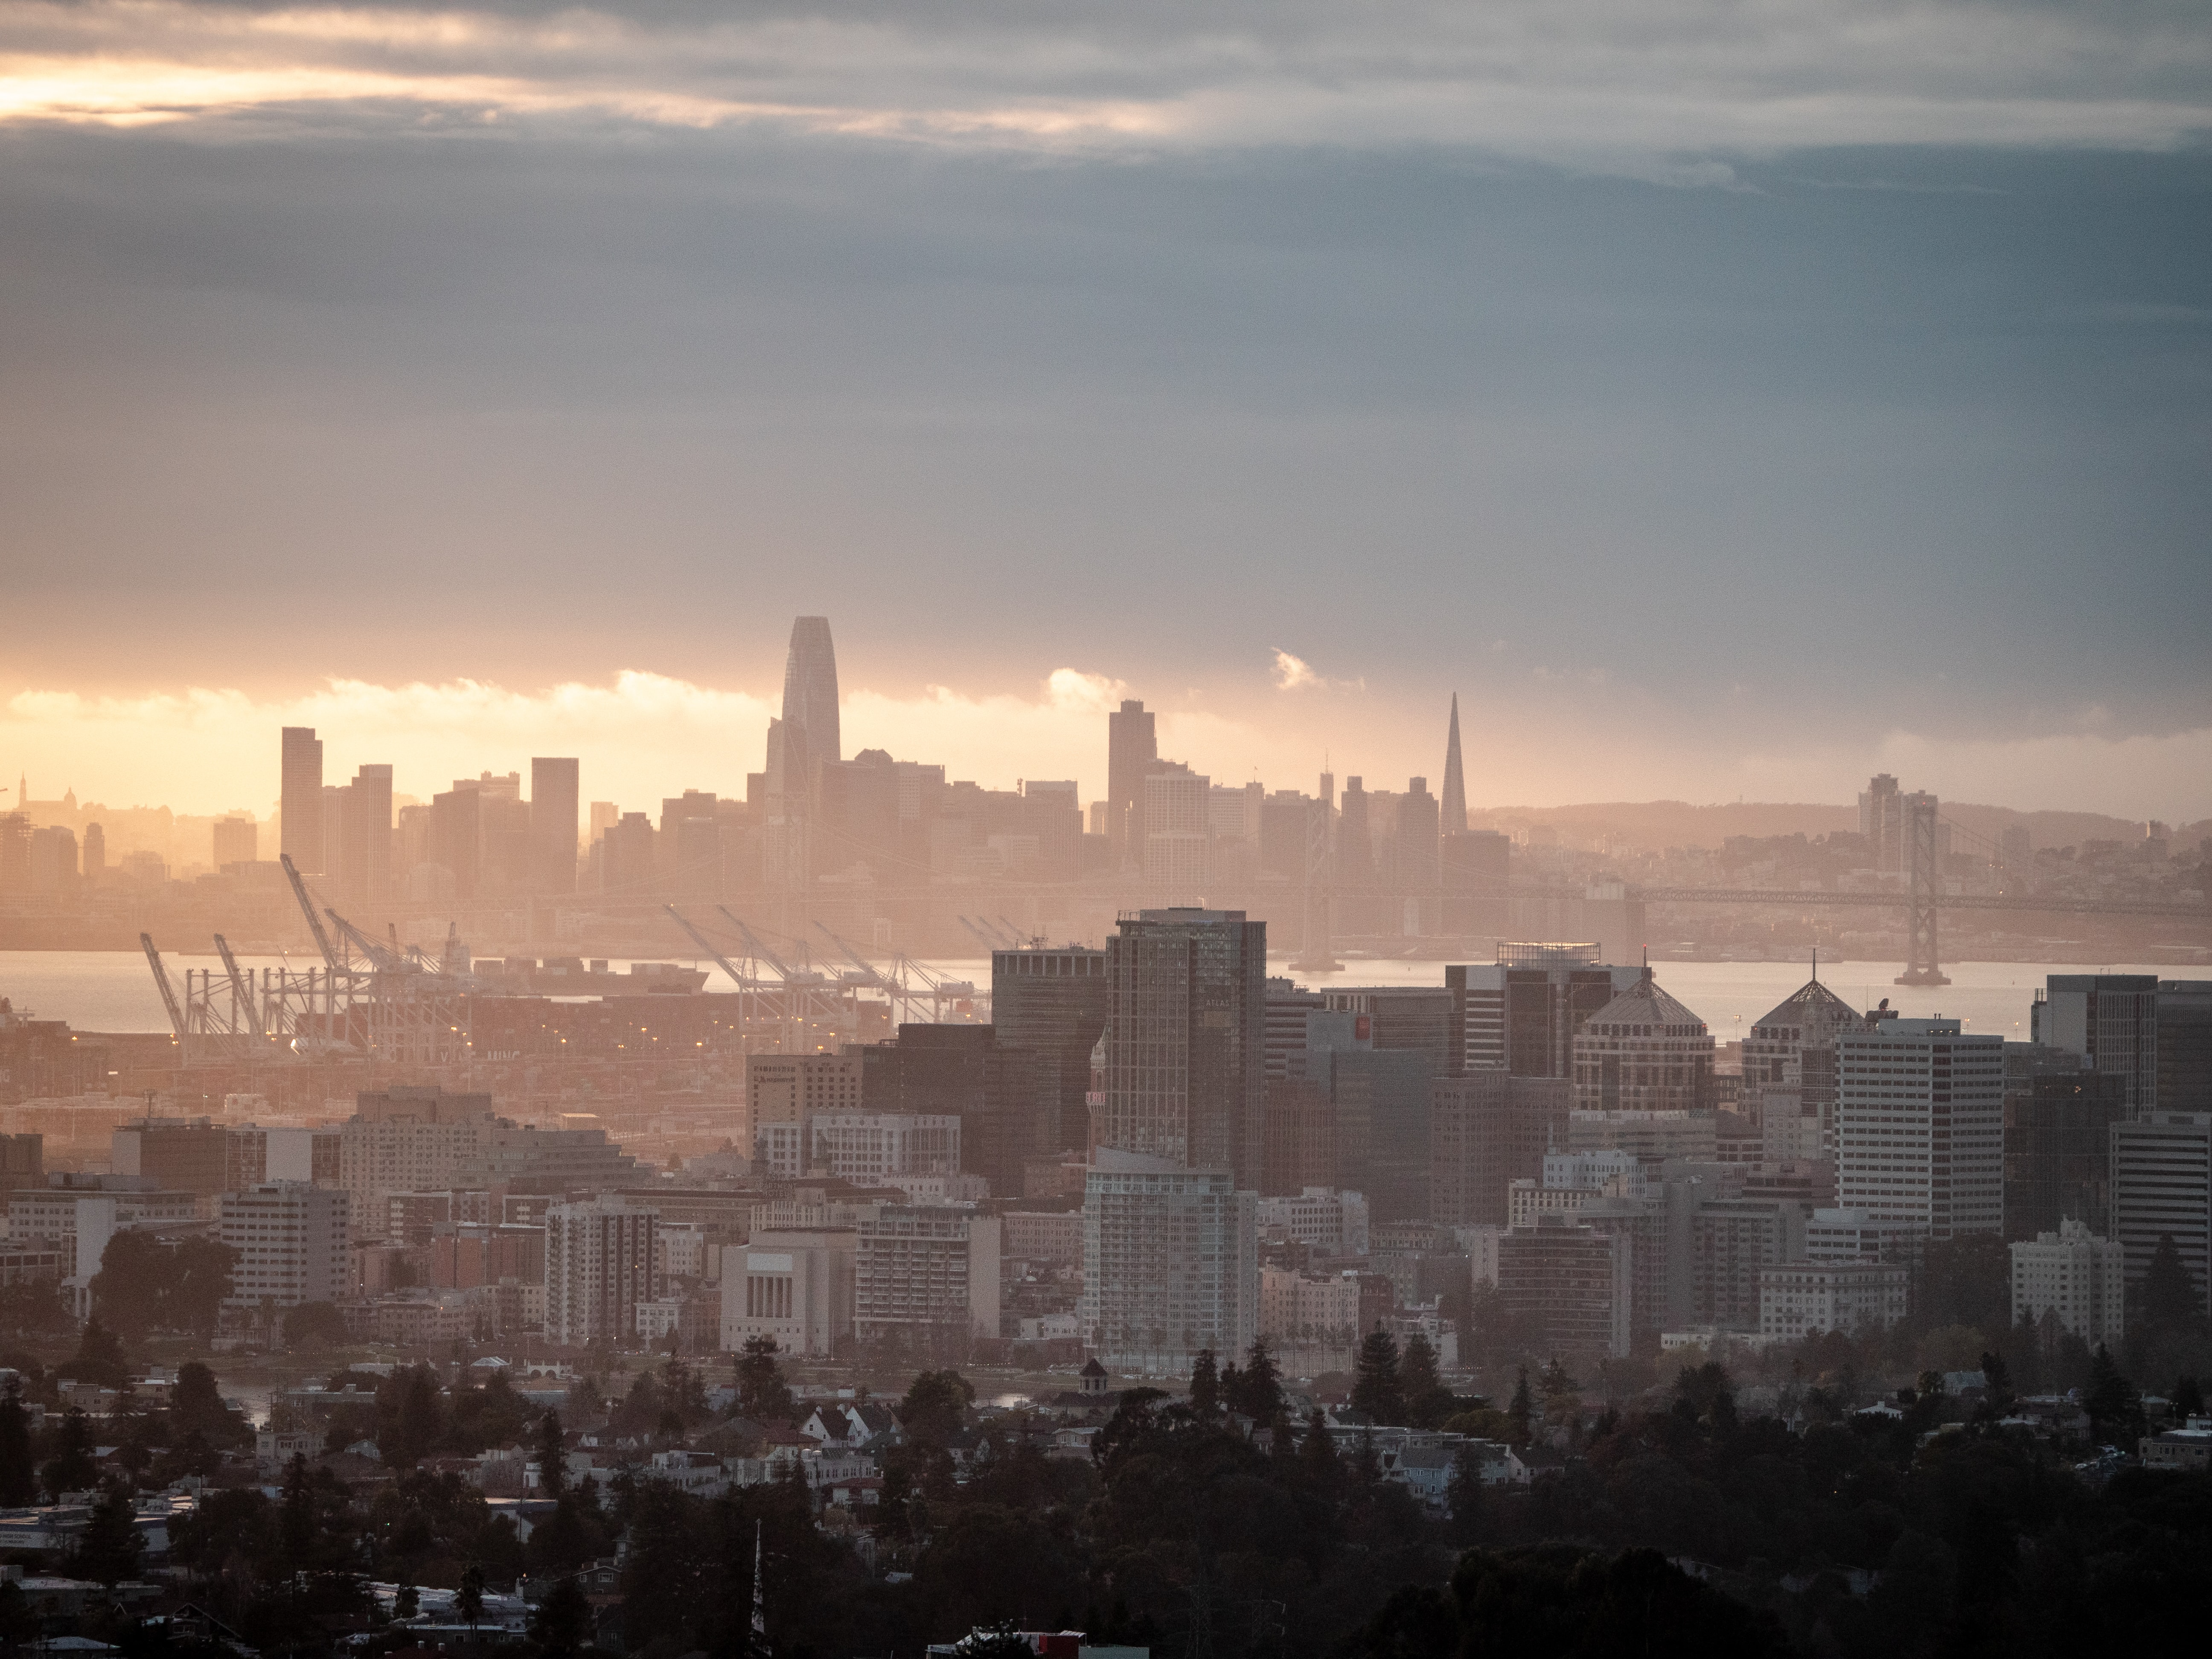 Urban skies over the San Francisco Bay Area